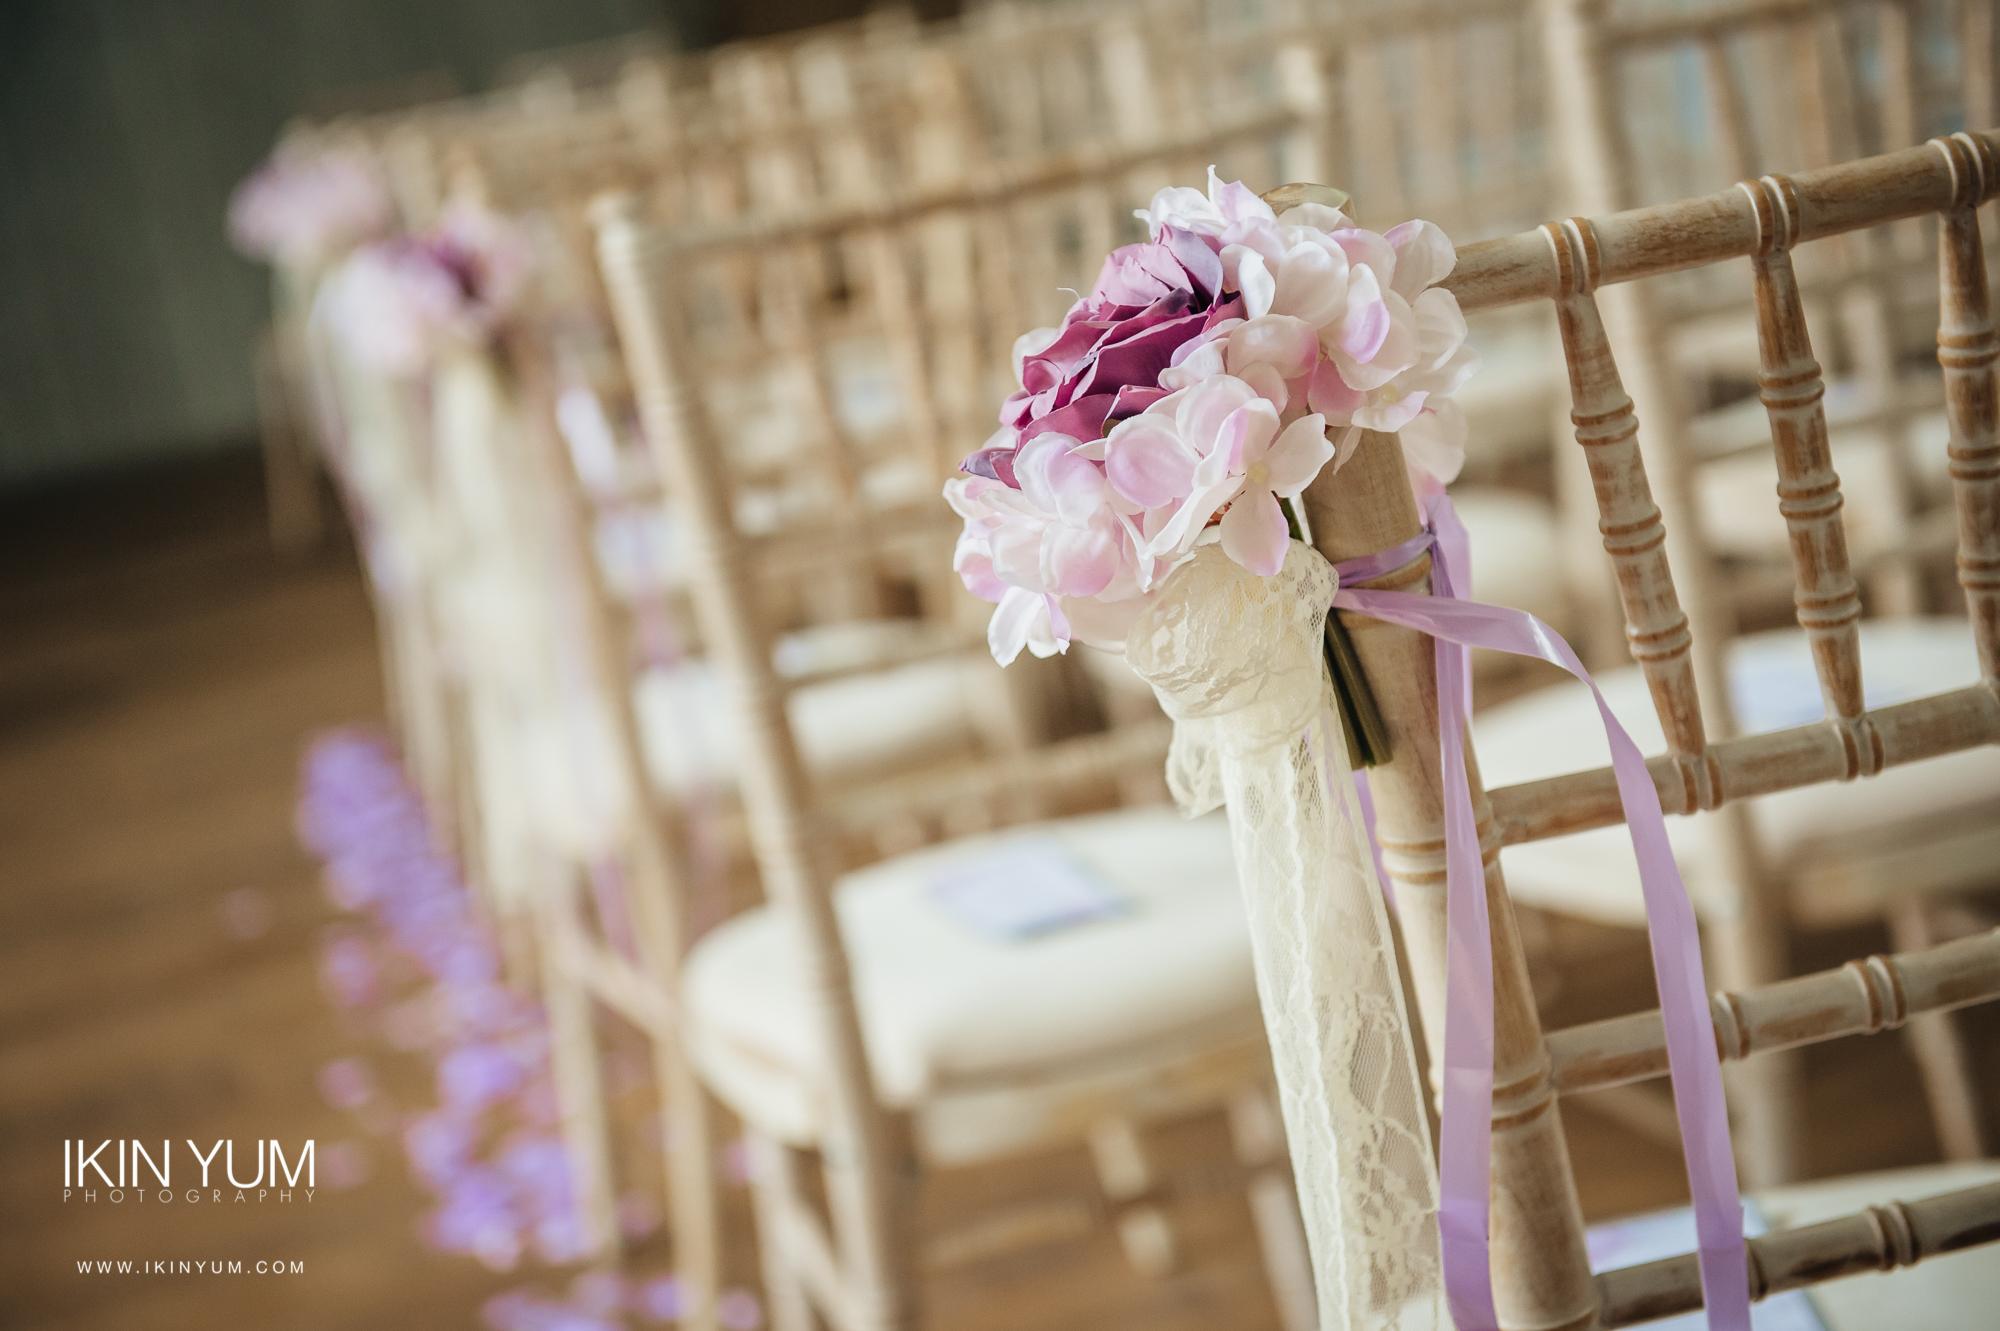 Hampton Manor Wedding - Ikin Yum Photography -052.jpg